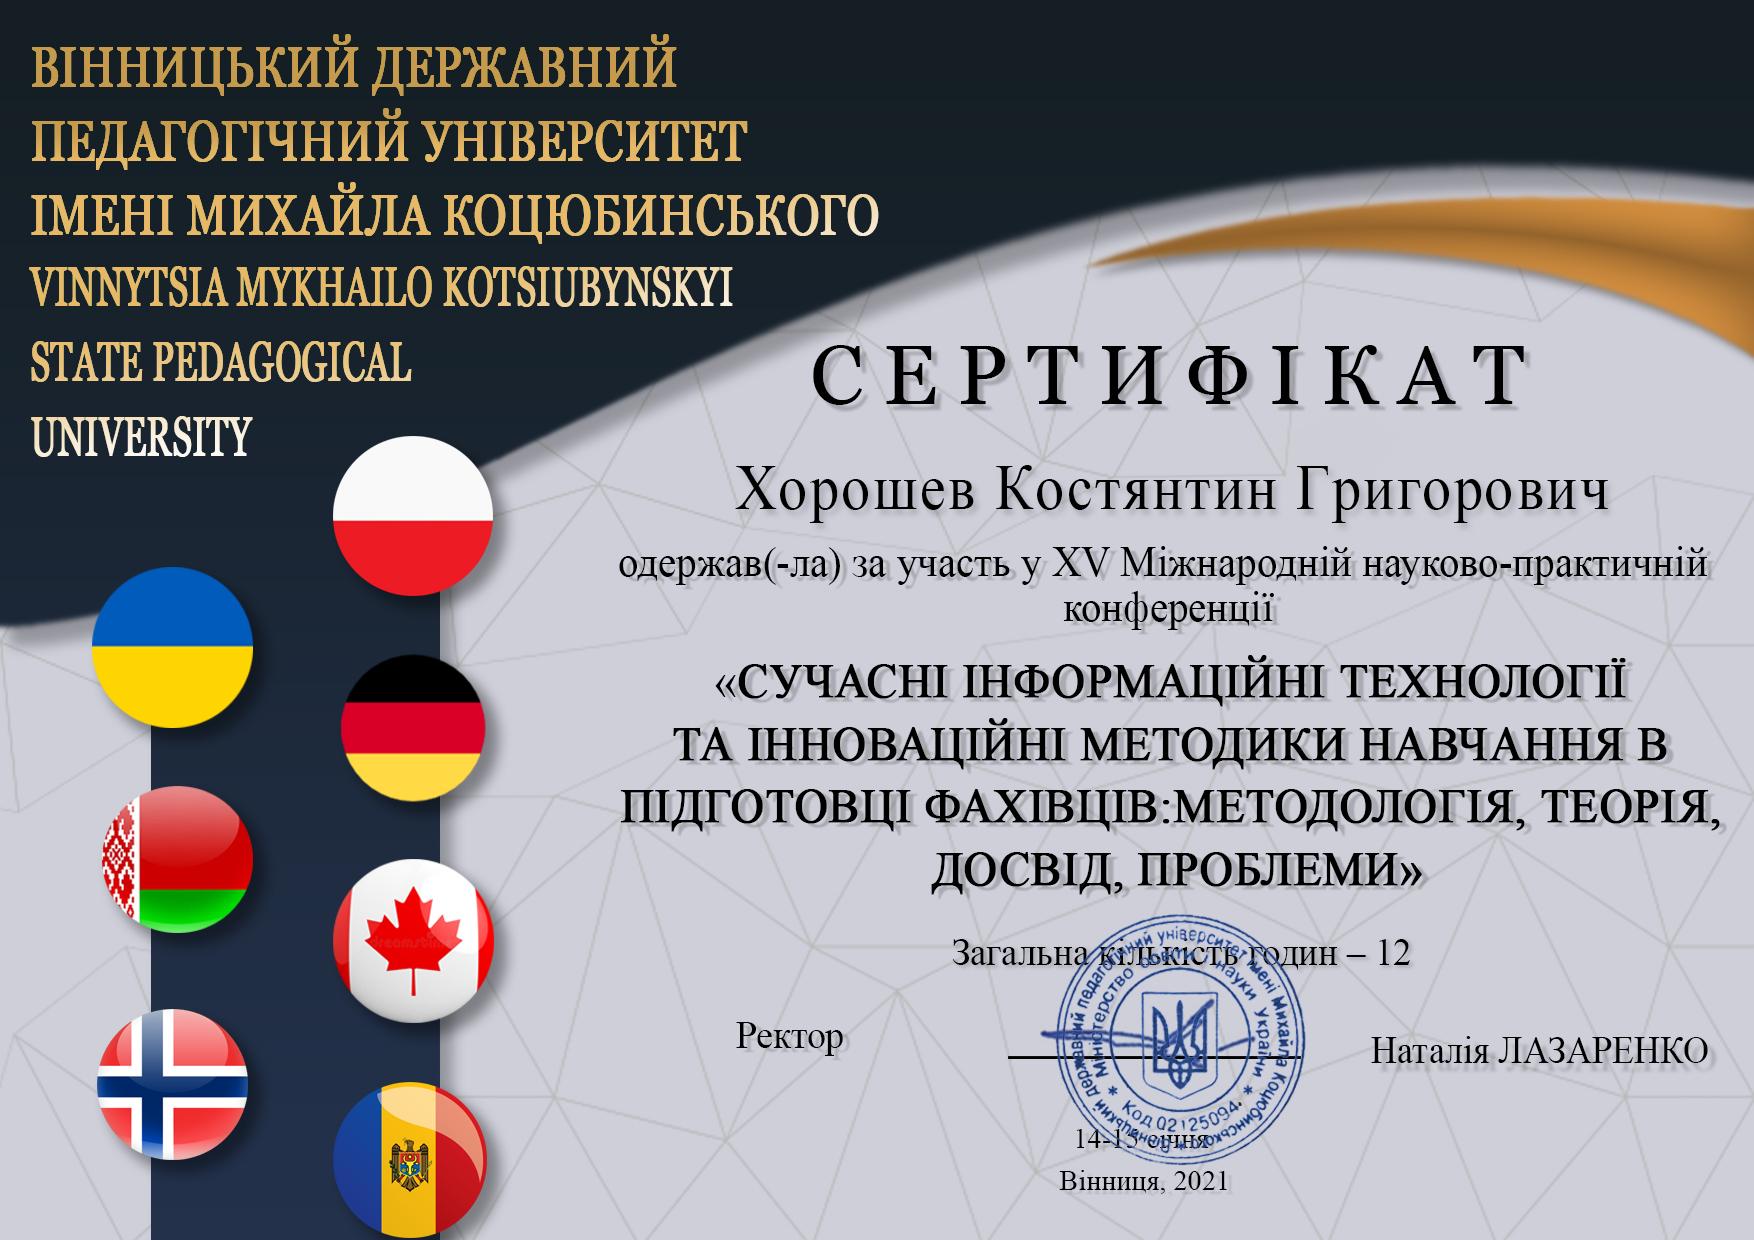 Хорошев Костянтин Григорович